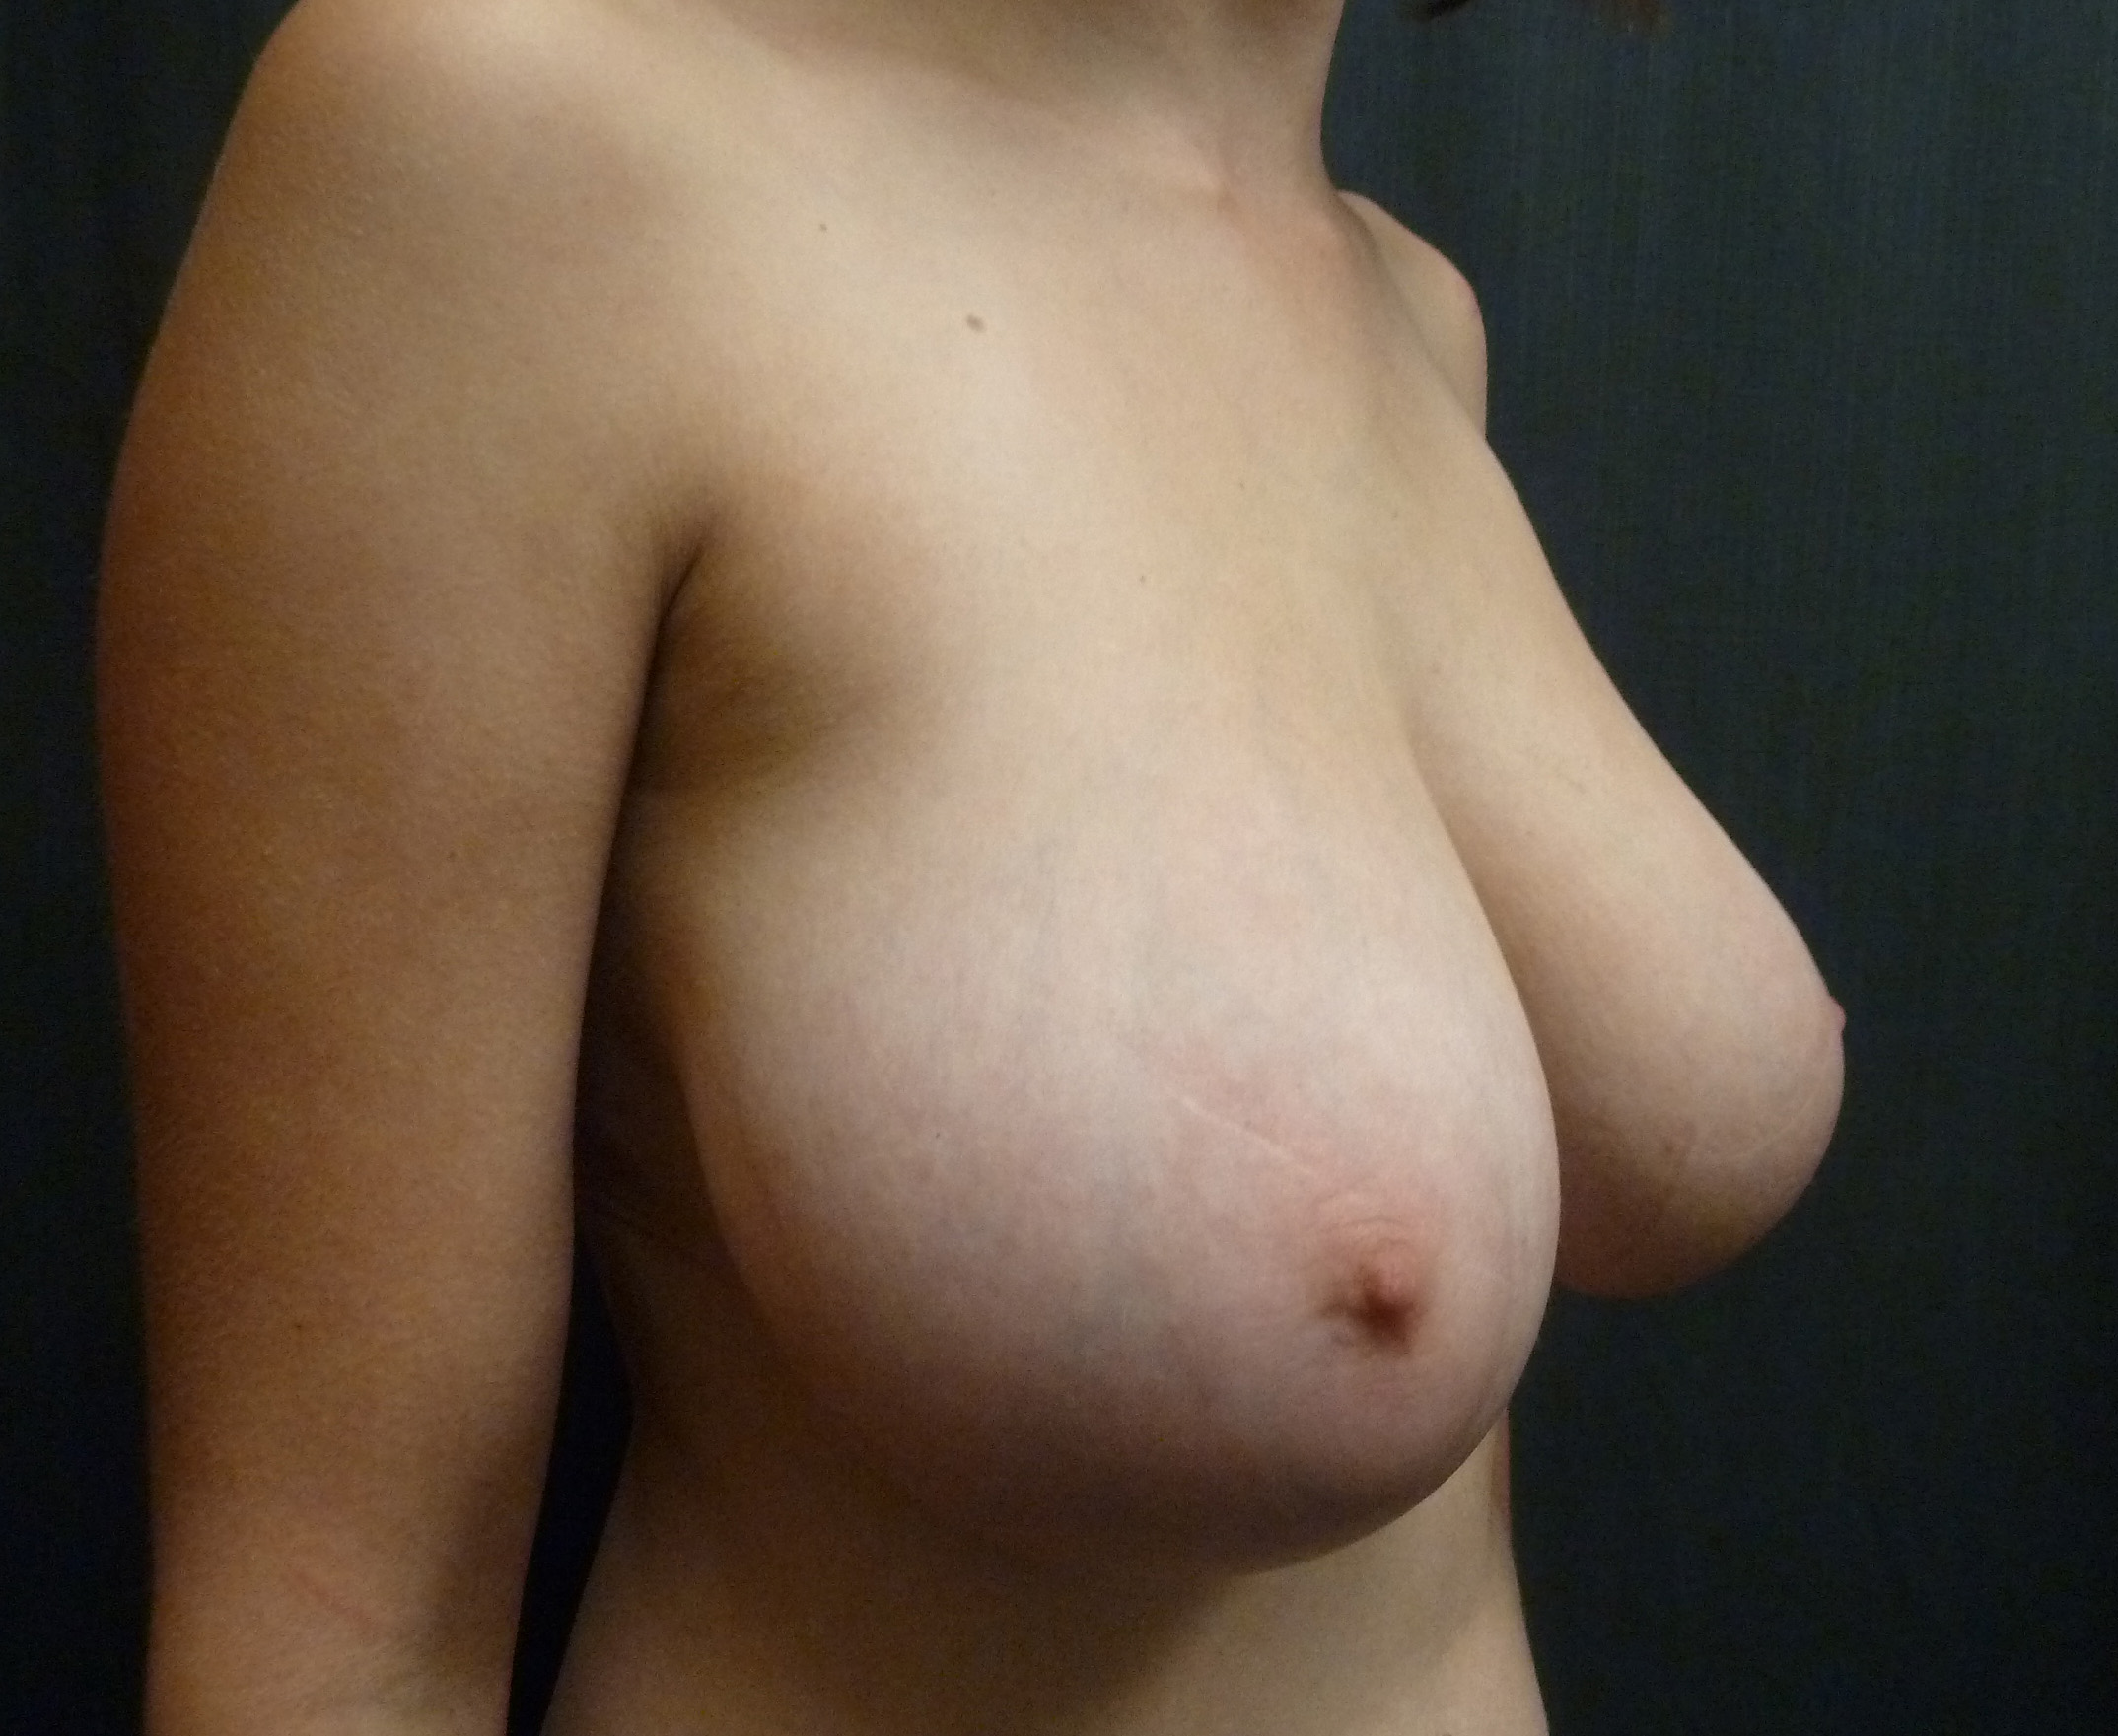 Ceydeli - Breast Implants